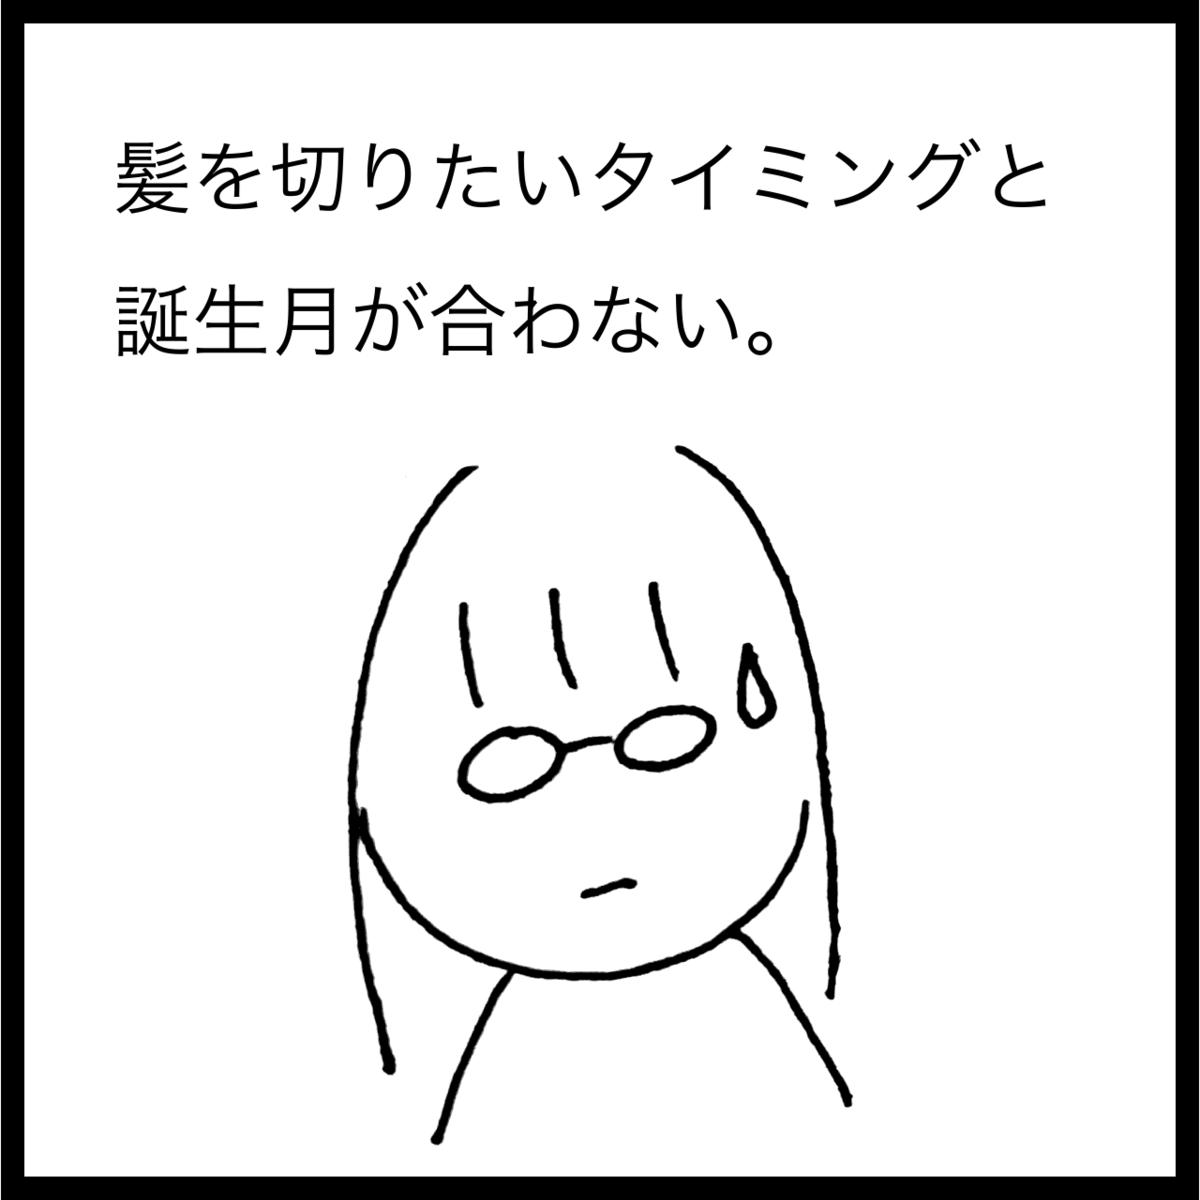 f:id:komyusyomama:20211010070503p:plain